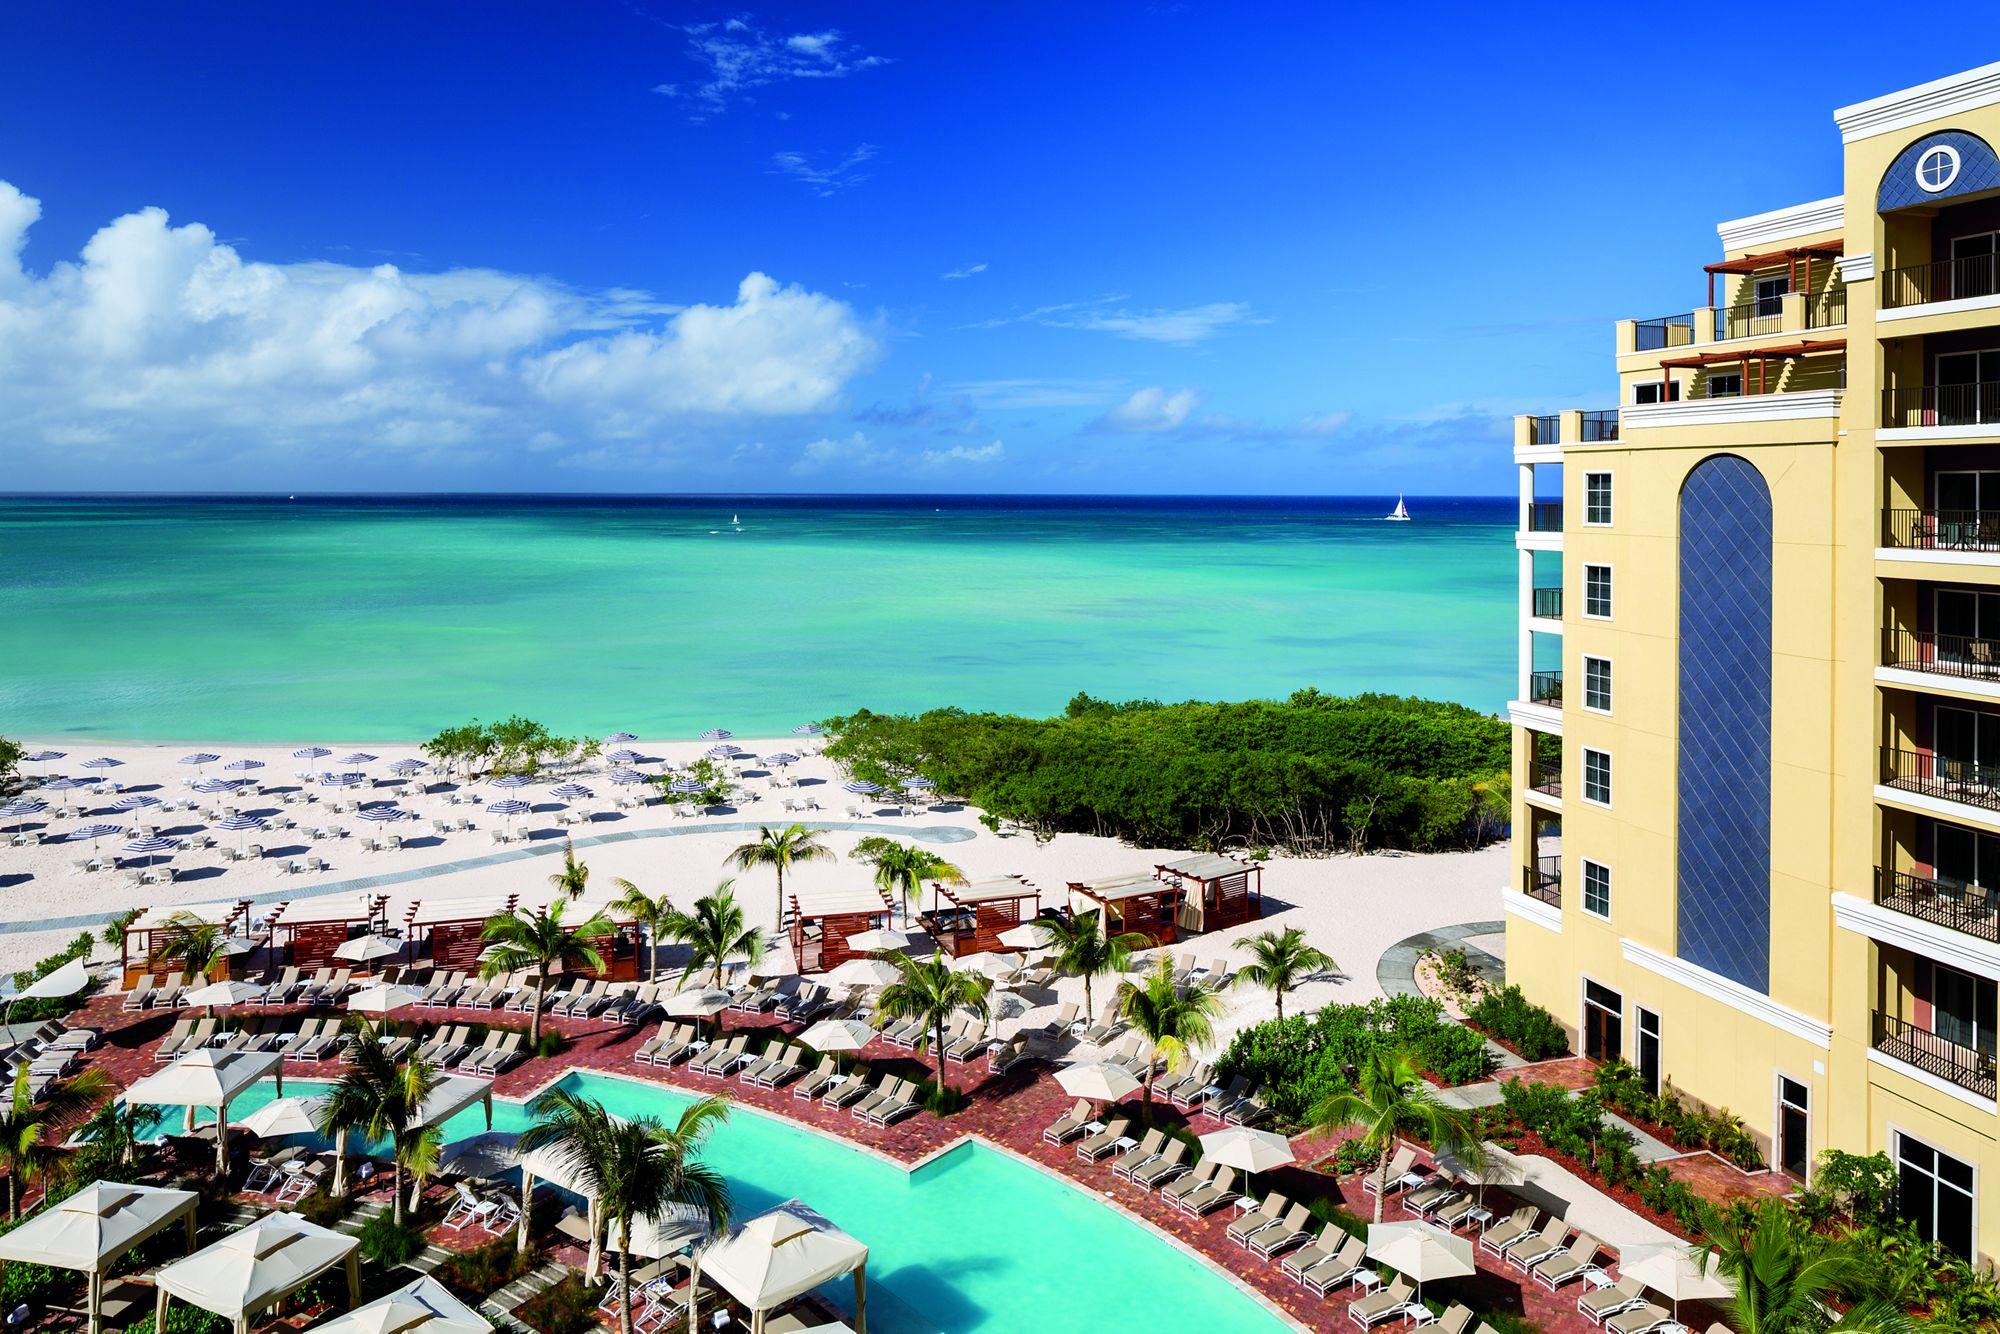 Ritz_Aruba_Daytime.jpg